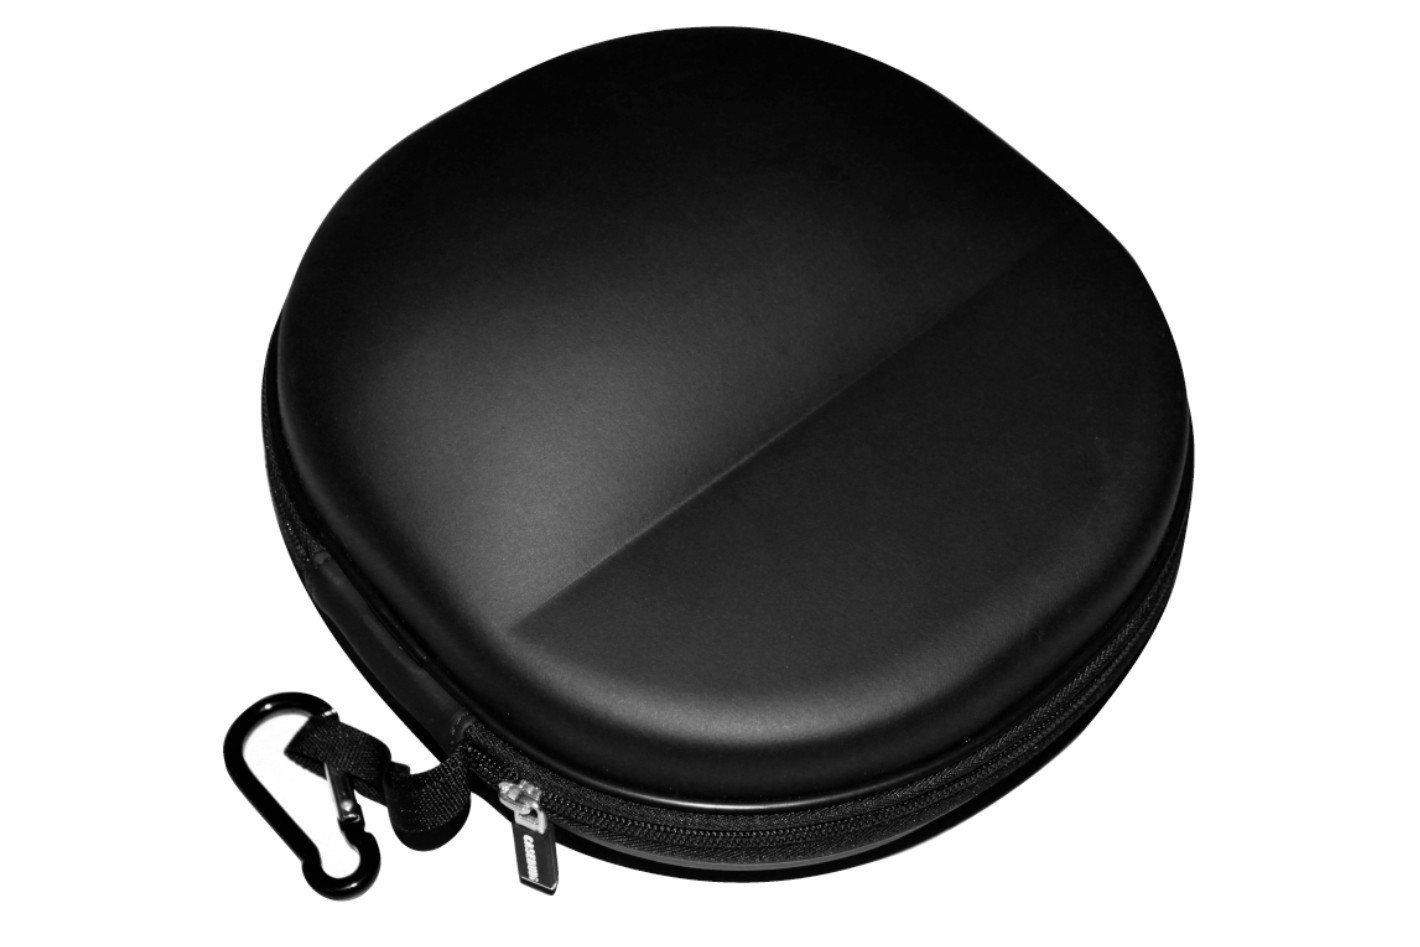 980bf046809 The PC Tech, Gadget, and Headphone Hub: Sennheiser Headphone Case ...